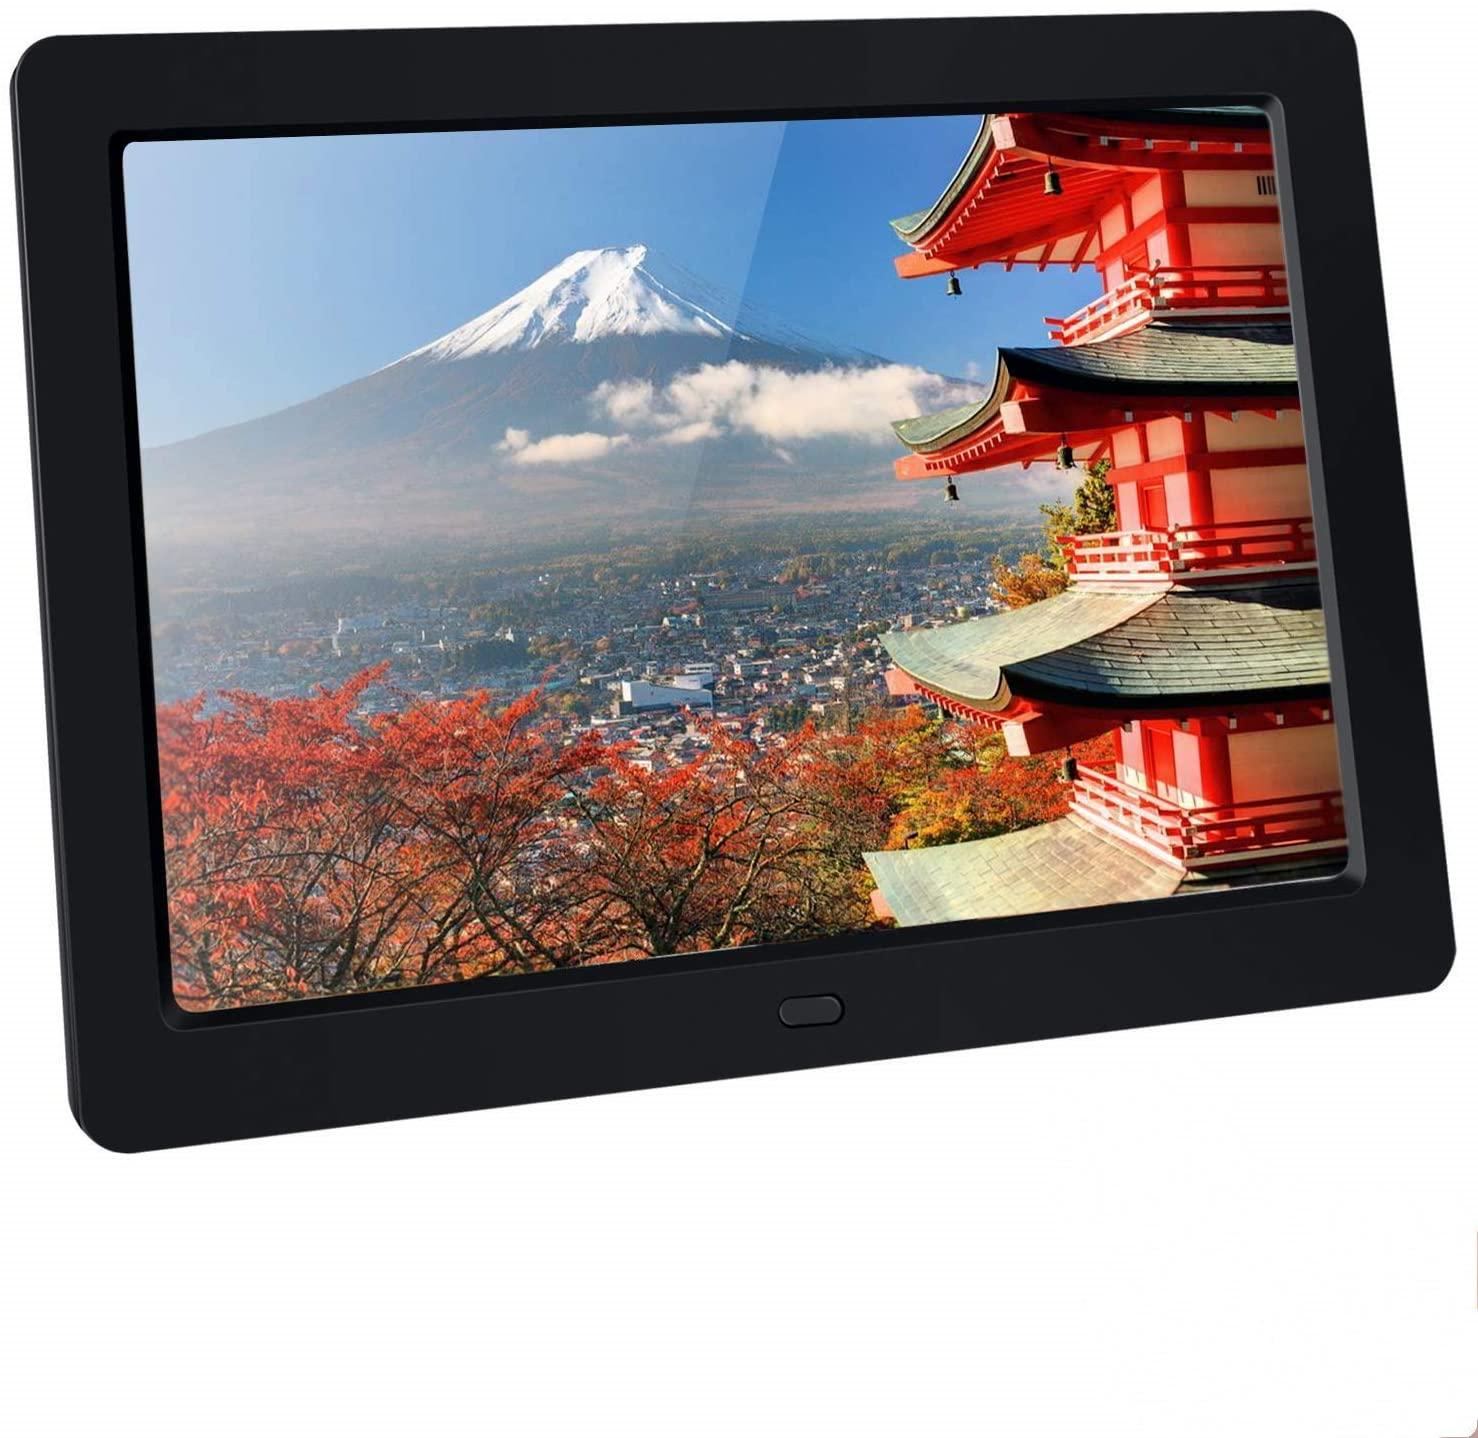 BRAV 10.1 inch Digital Picture Frame HD1280×800 IPS Screen Support Photo/Video/Music/Clock/Calendar Contains 32G High-Speed SD Card